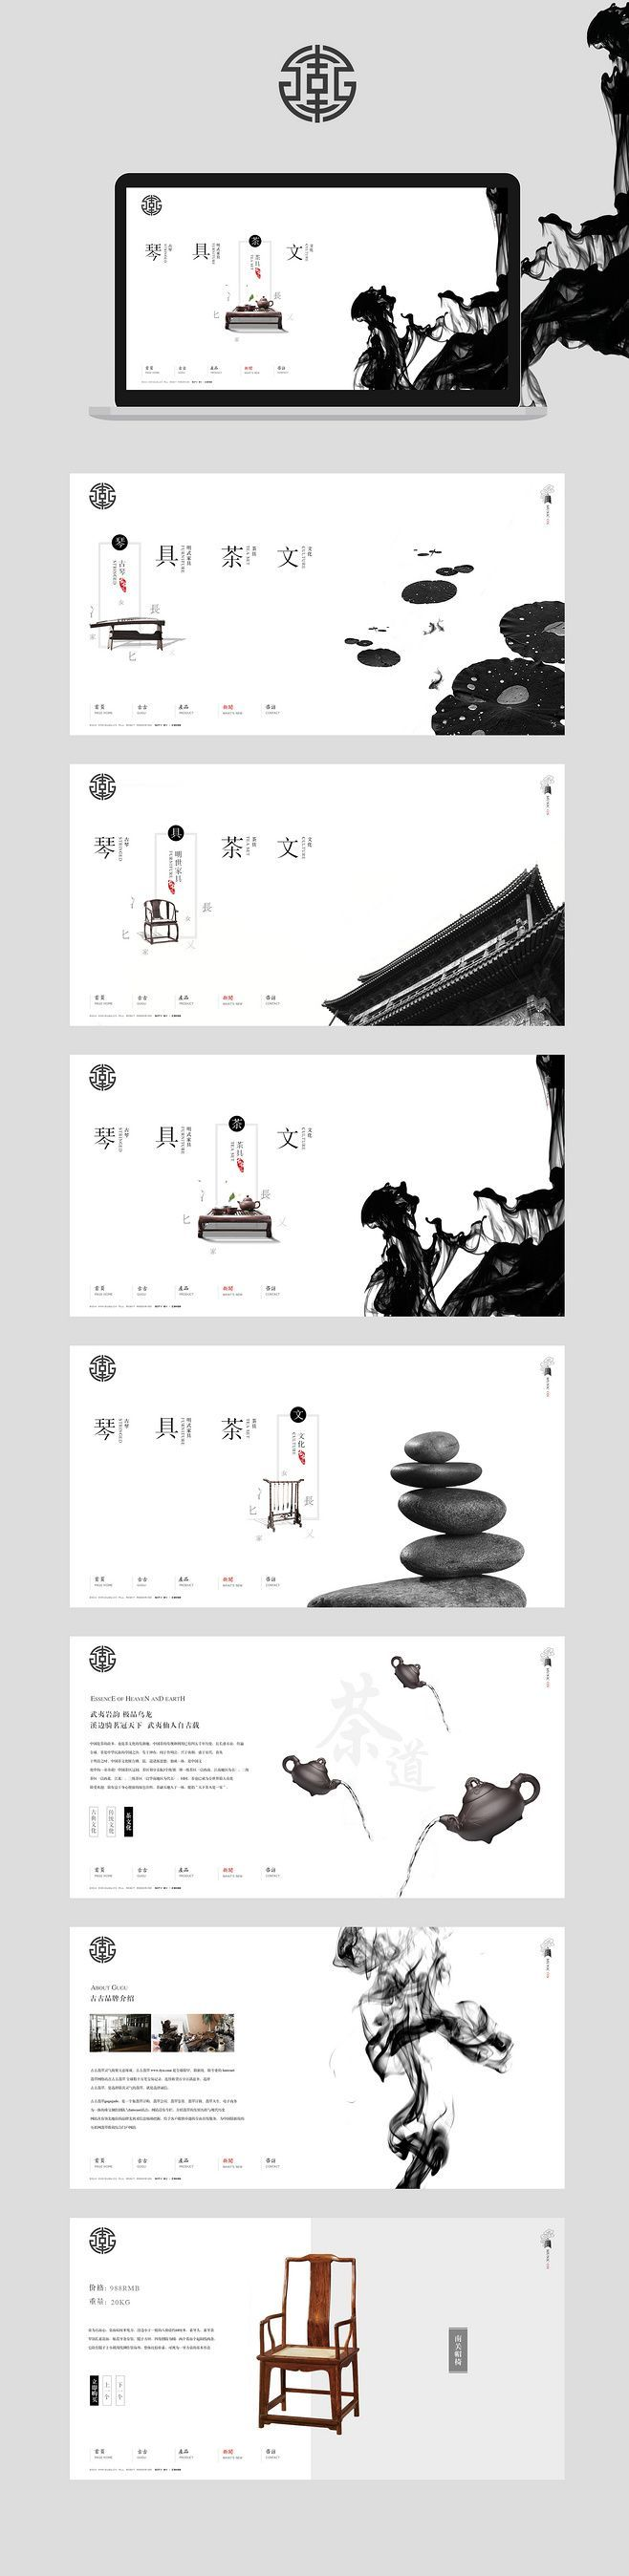 GUGU(极简中国风)_秀作品_曾山主页...@白色丶风车采集到【Web】(523图)_花瓣UI/UX. If you like UX, design, or design thinking, check out theuxblog.com